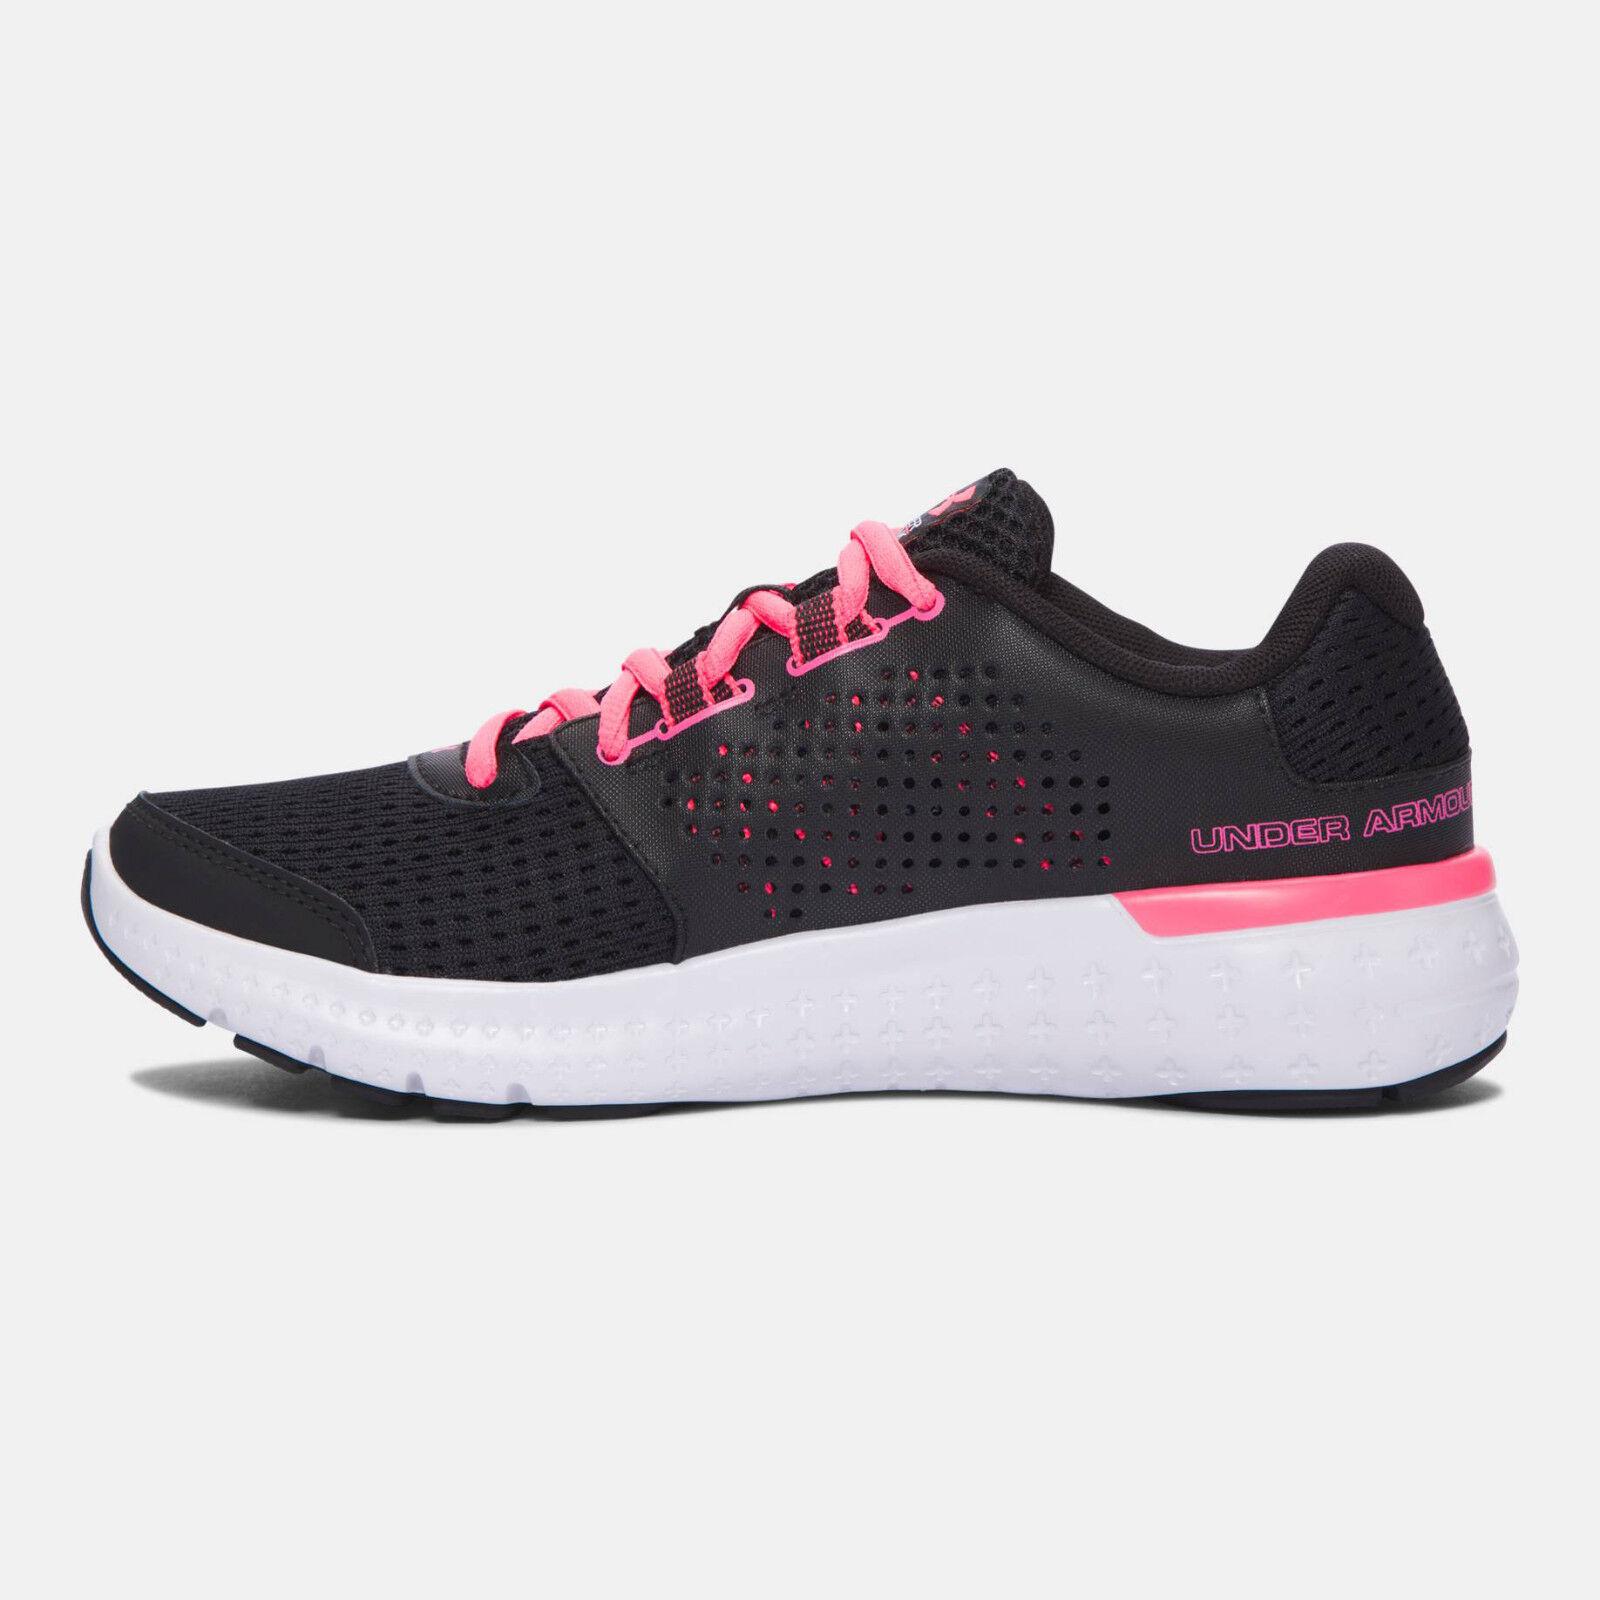 Under Armour Micro G Fuel Women's Shoes Black / White (1285487 005)